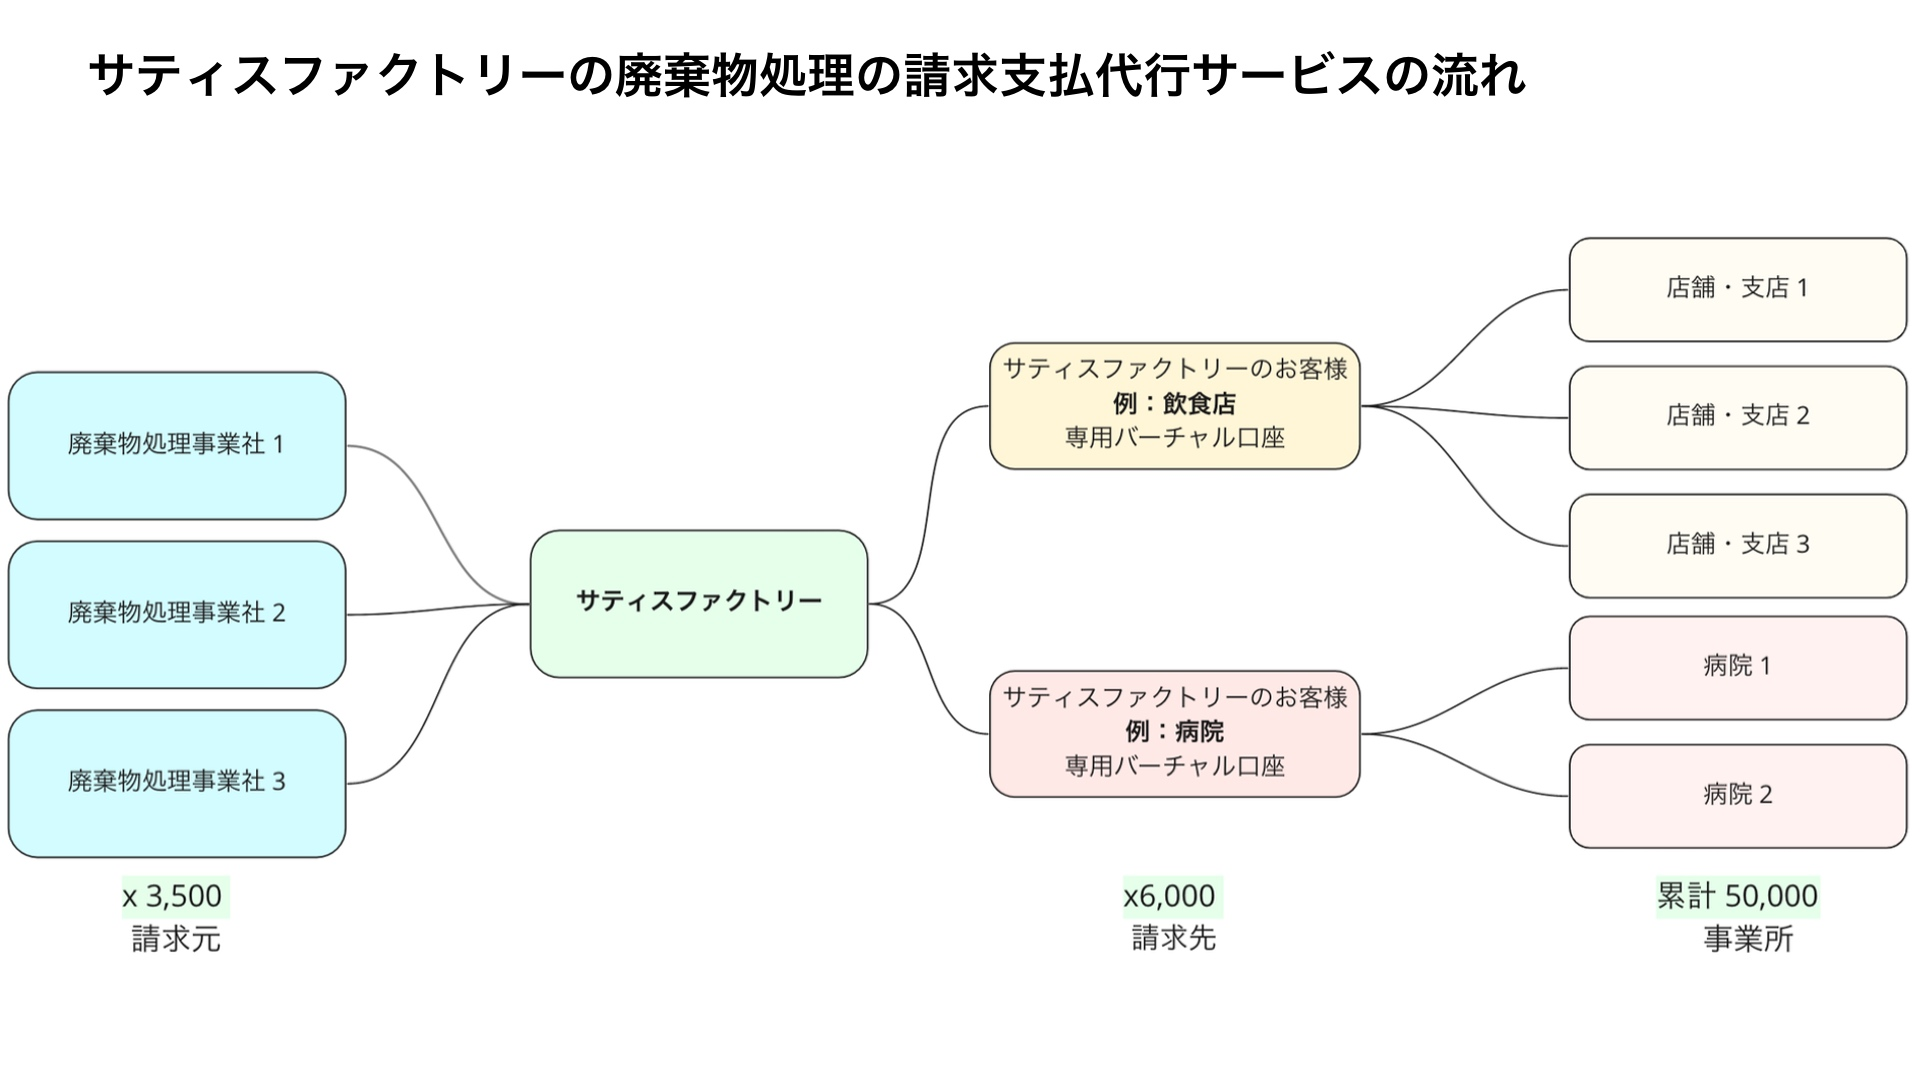 Moneytree LINK 導入事例 サティスファクトリーの廃棄物処理の請求支払代行サービスの流れ